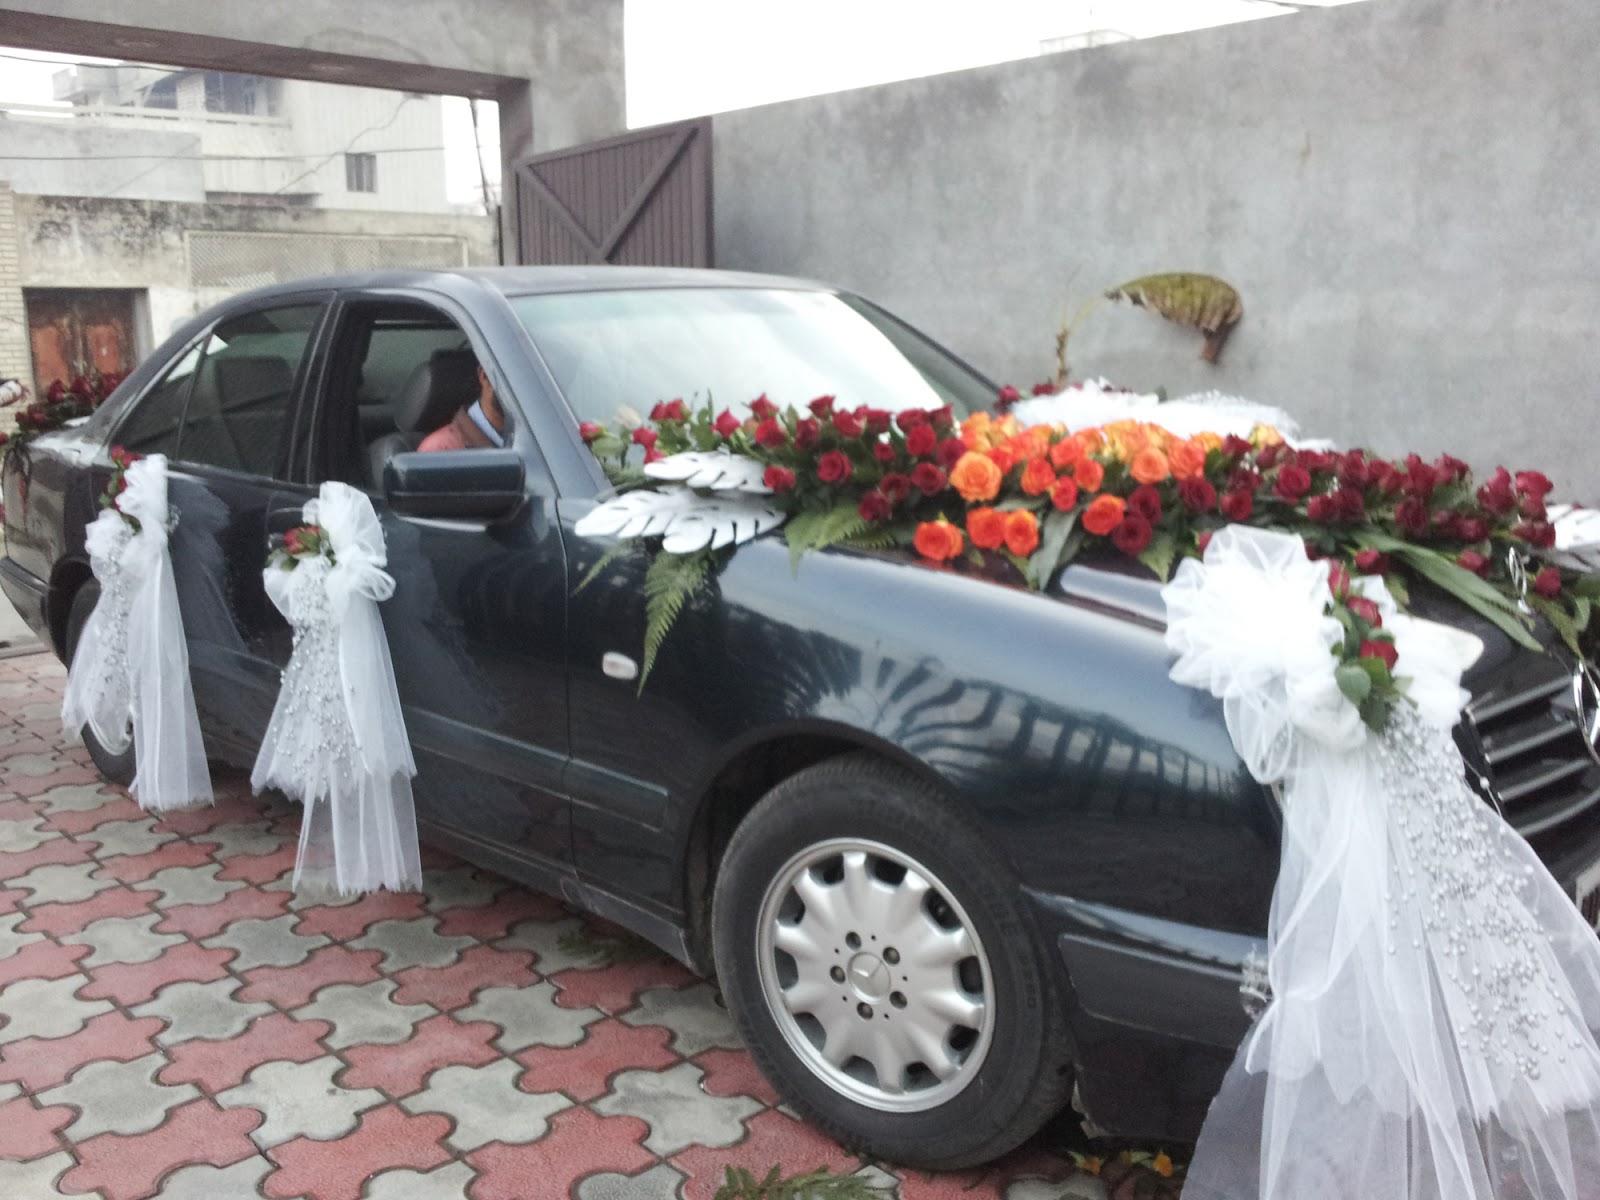 Mercedes E Class Wedding Pictures July 2013 Car Rental Punjab Self